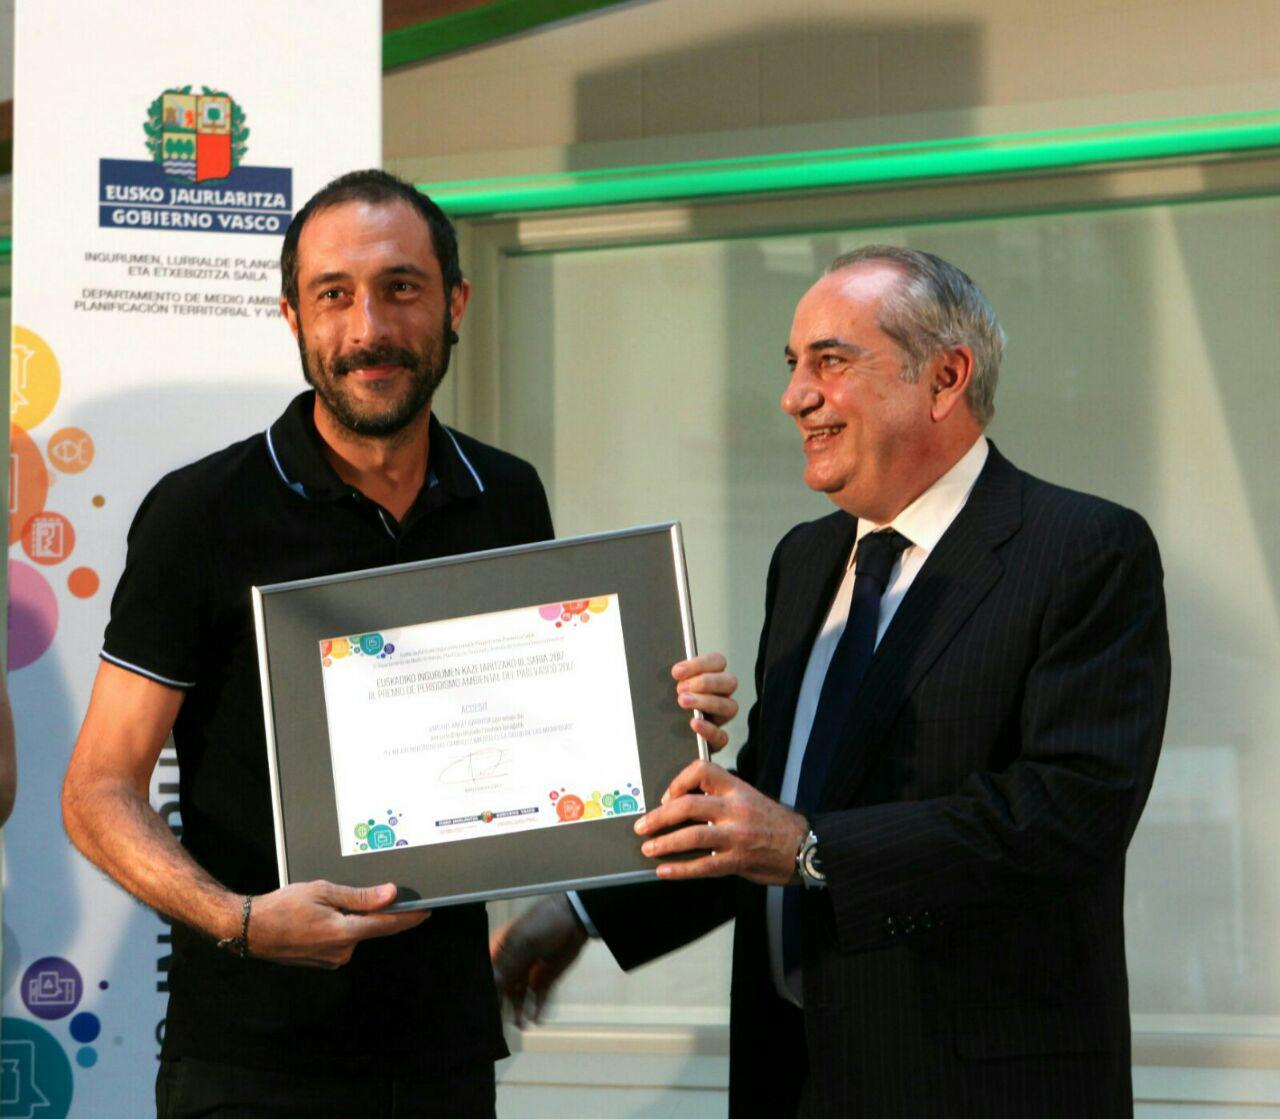 miguel_angel_garrosa_premio_peridodismoambiental.jpg